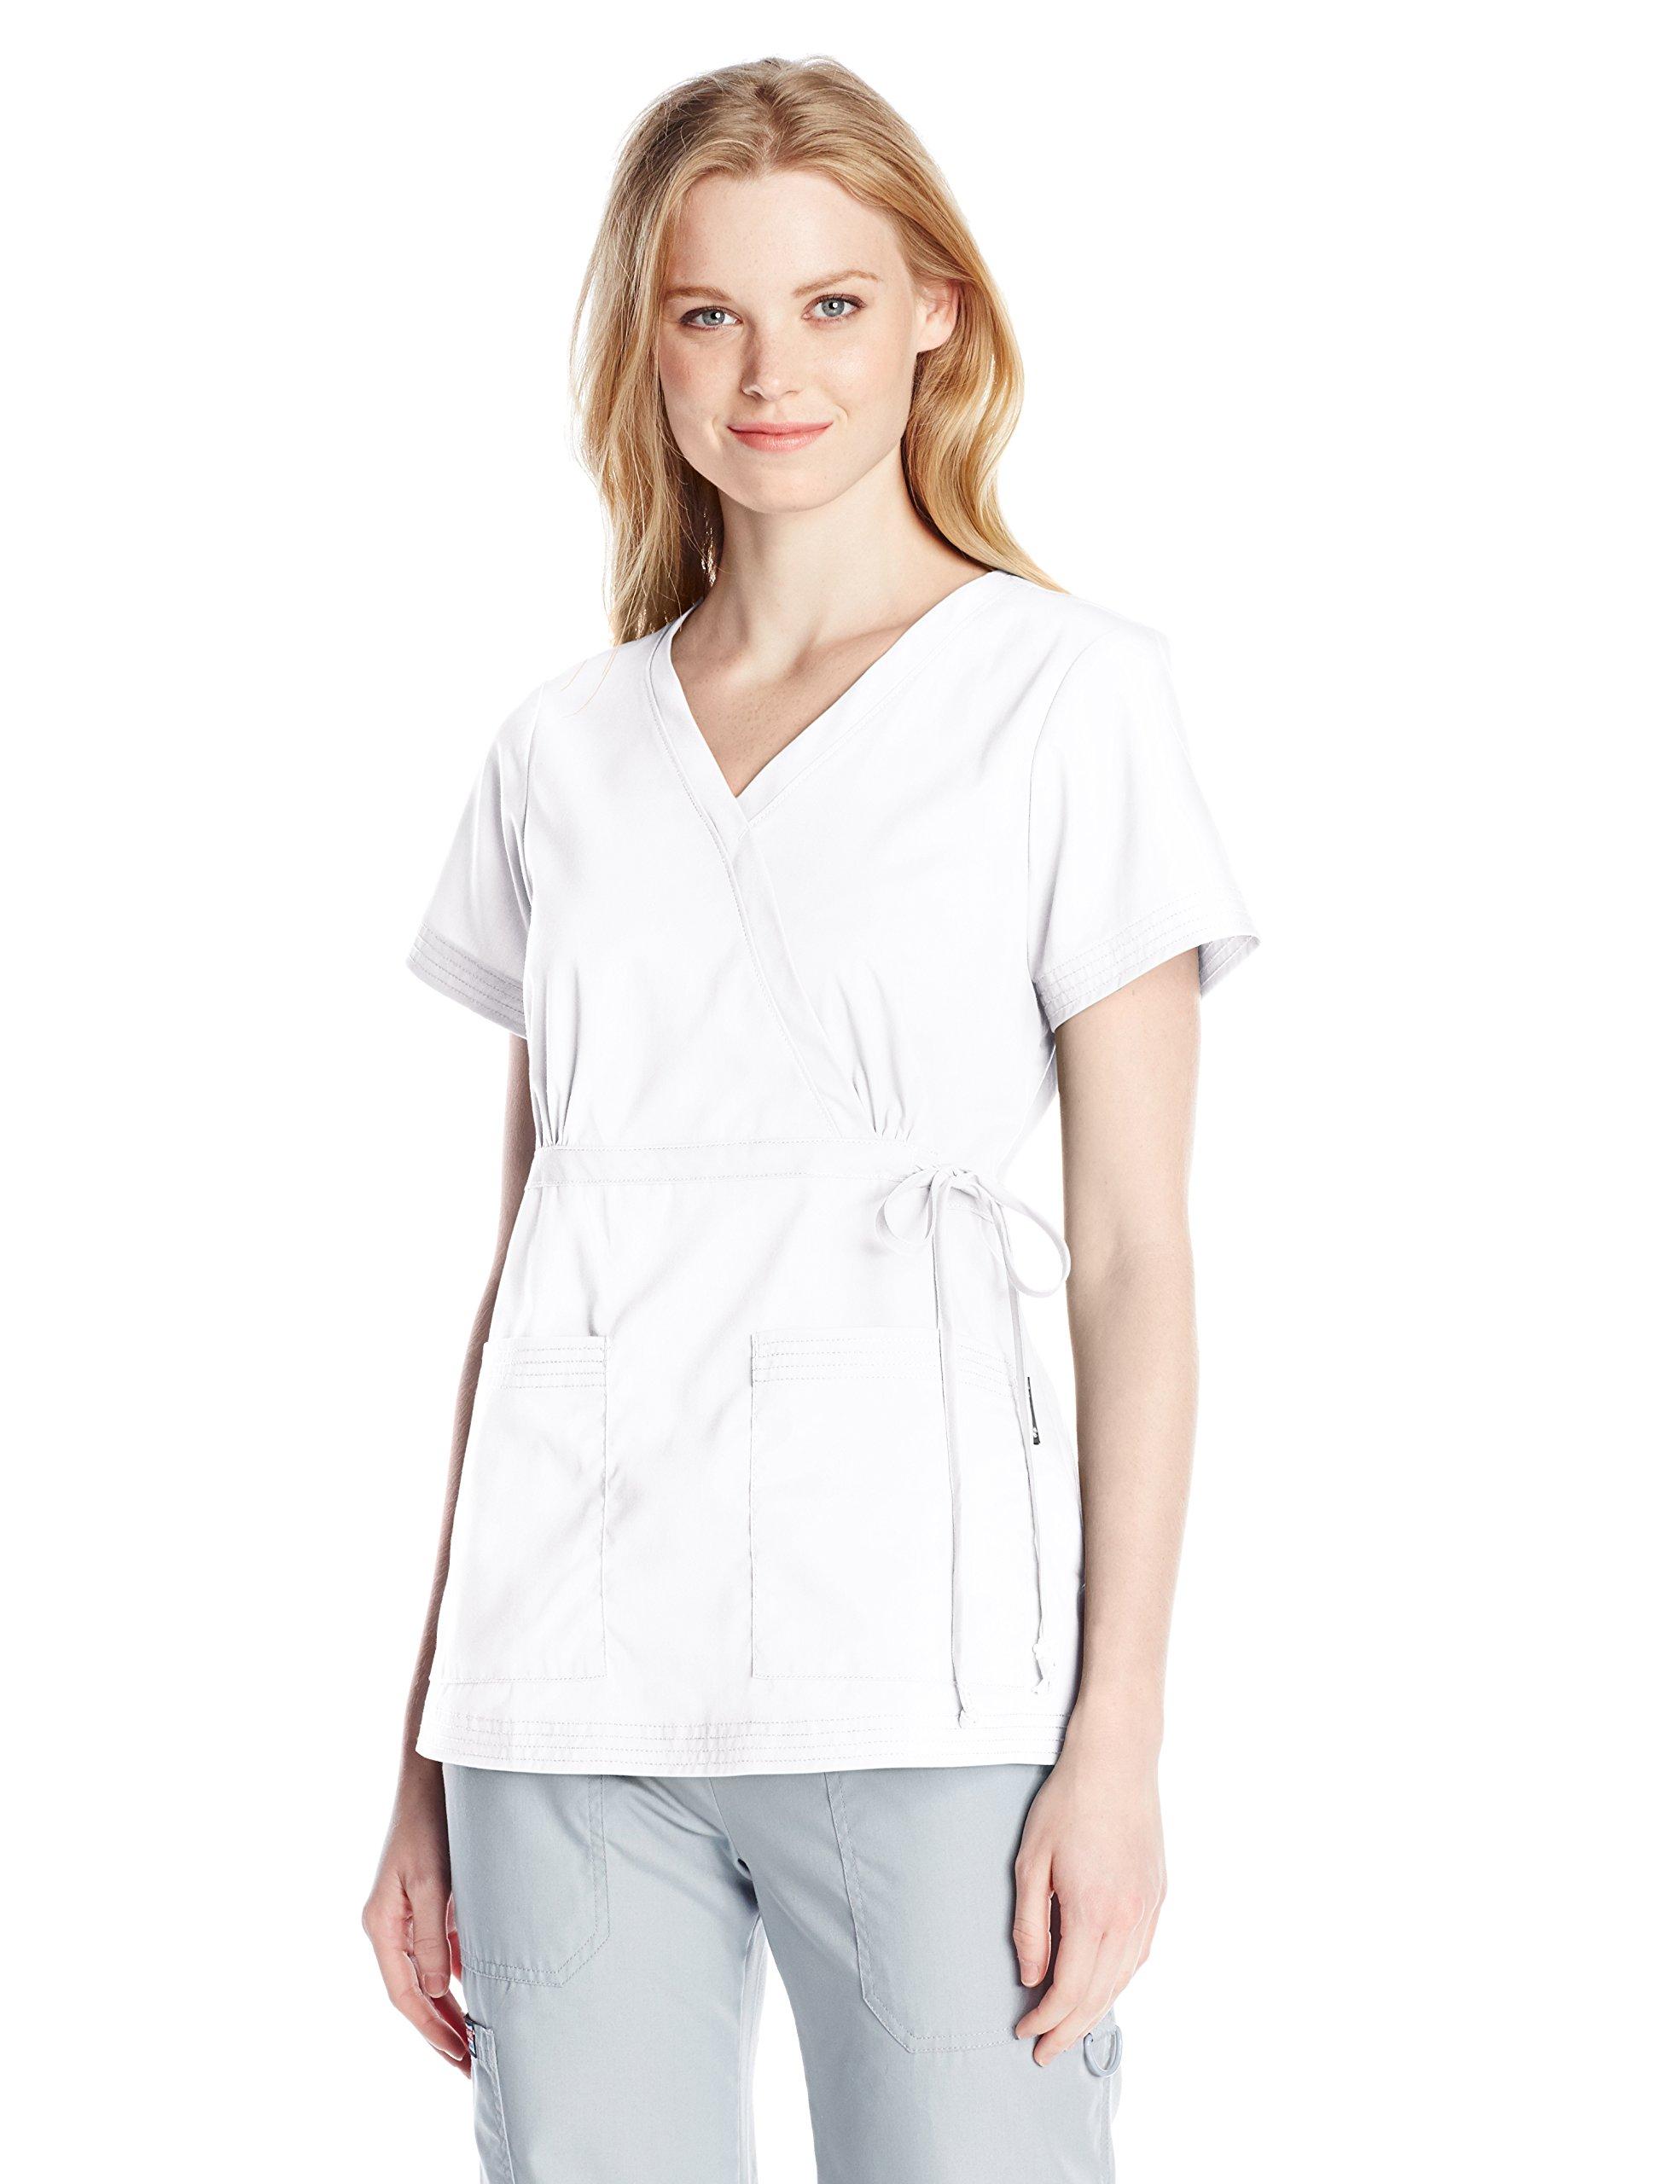 KOI Women's Katelyn Easy-Fit Mock-Wrap Scrub Top with Adjustable Side Tie, White, Large